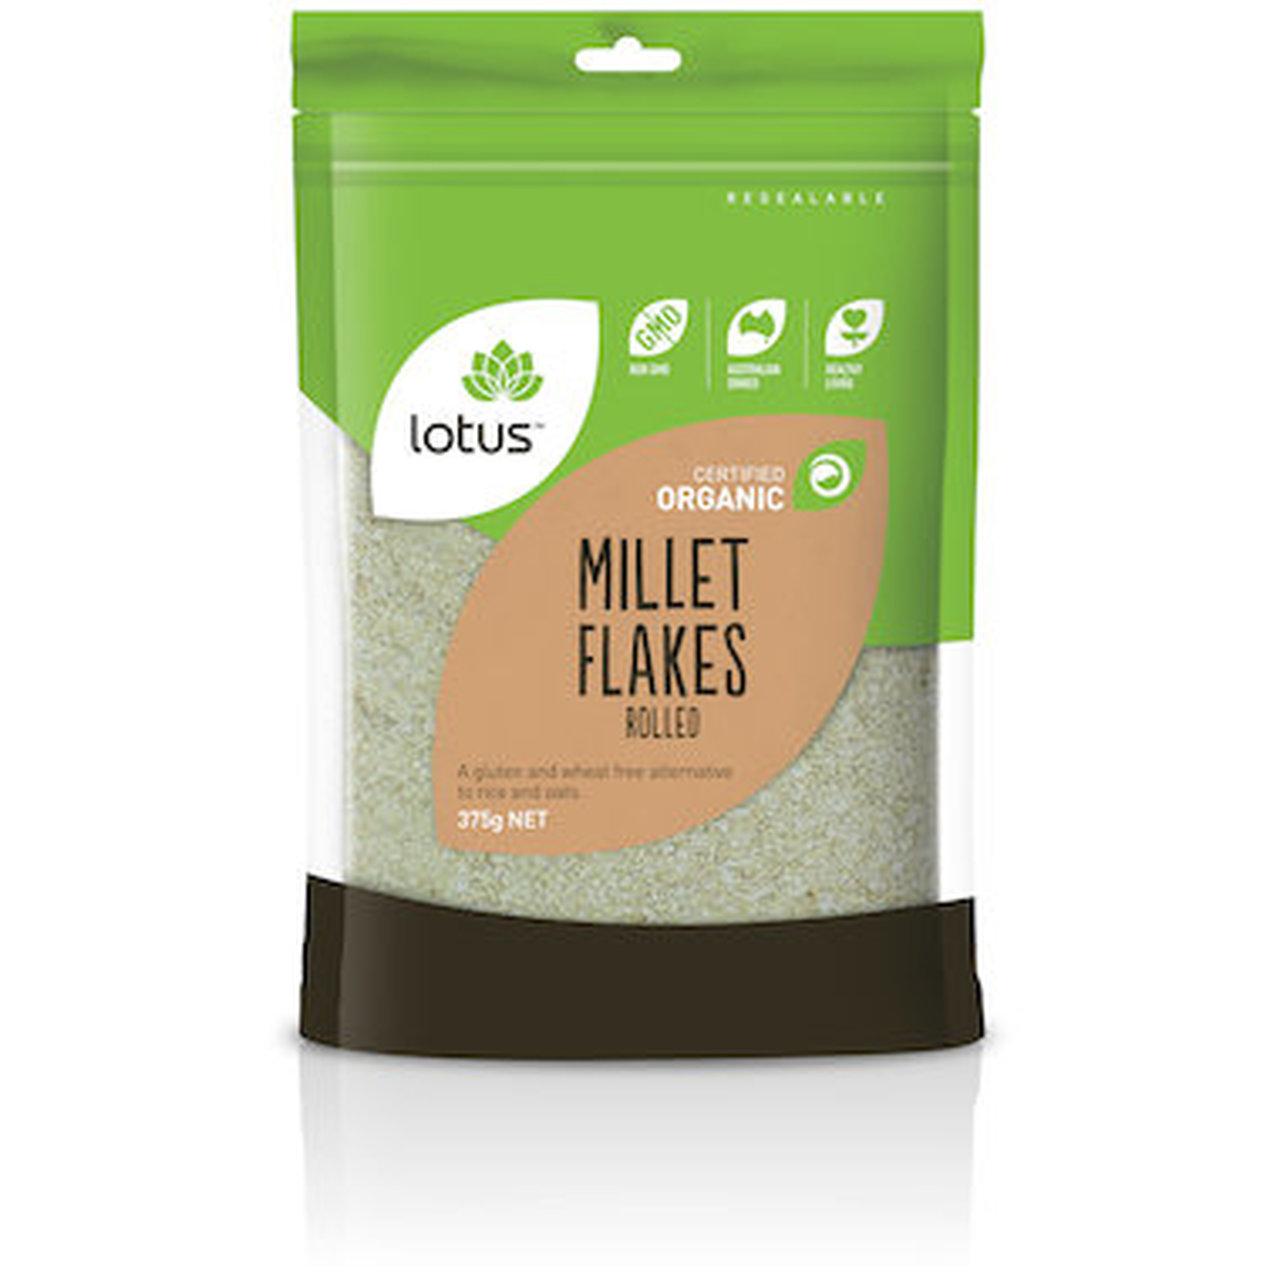 Lotus Millet Flakes Rolled 375g